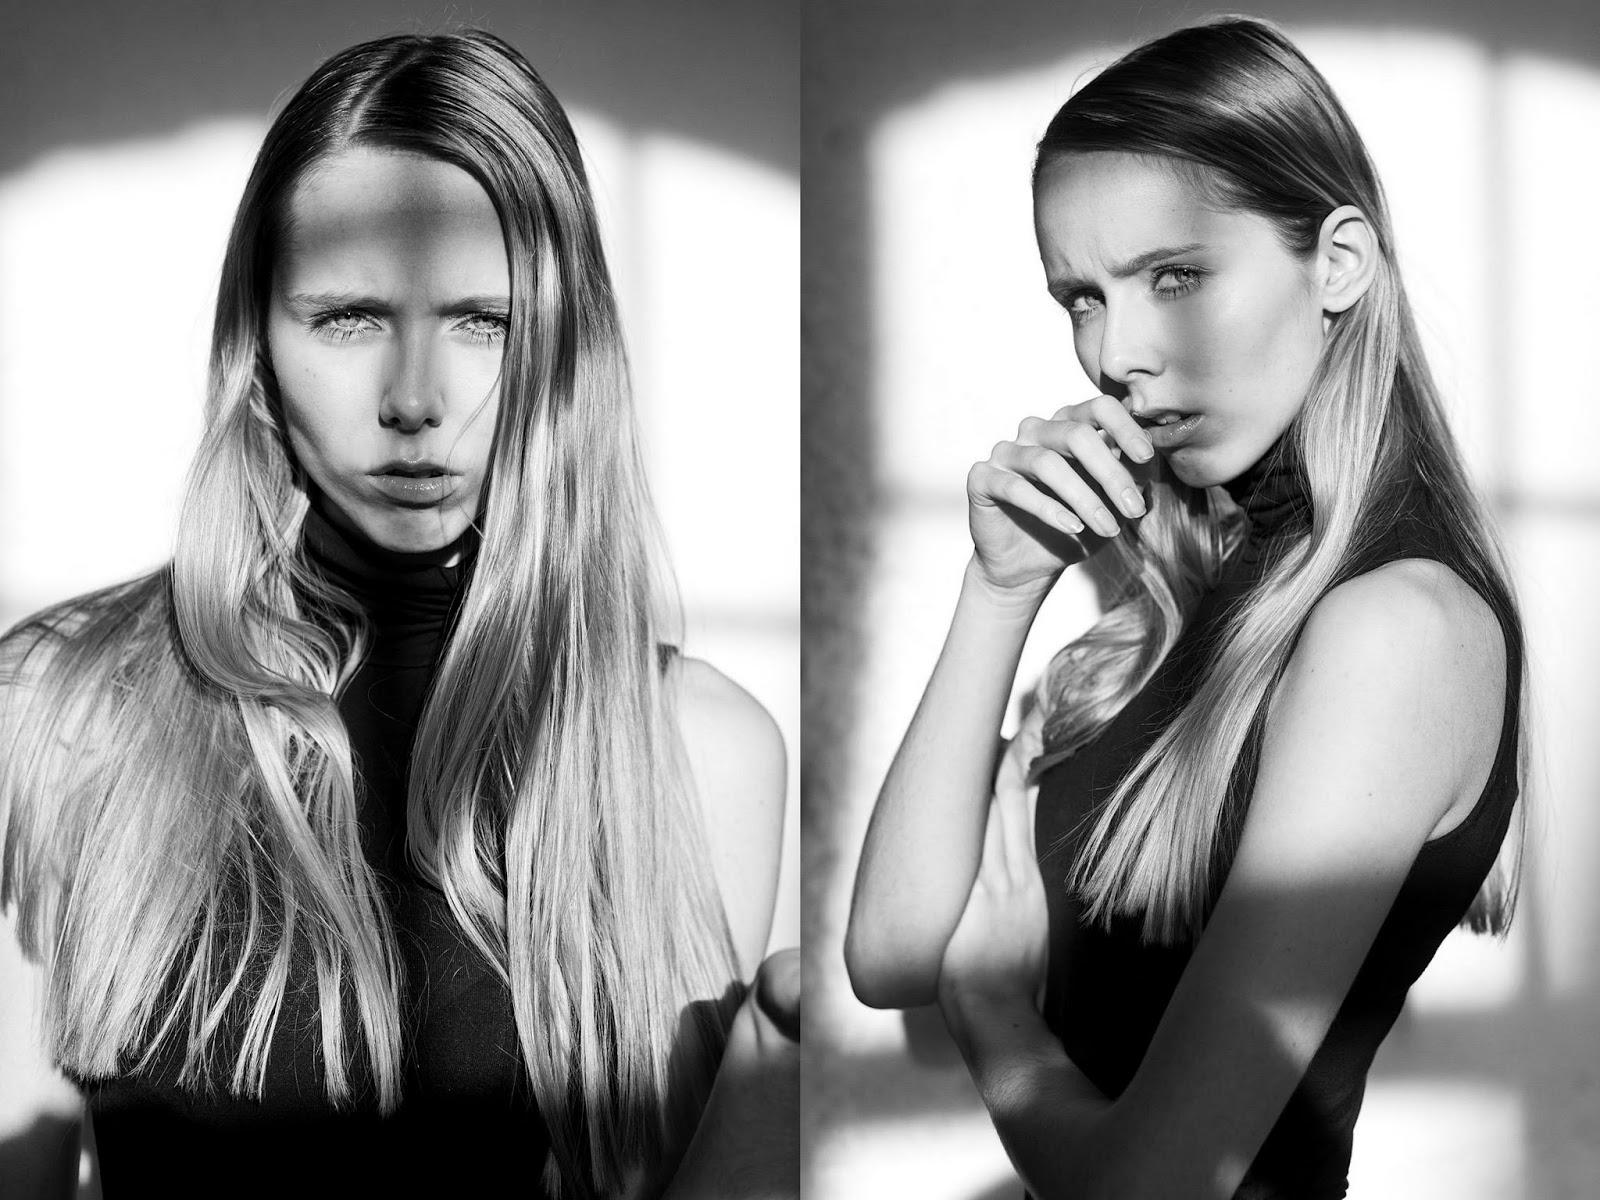 Ismaele Bulla Photography Studio13 Amsterdam daglicht fotostudio model Joanne M